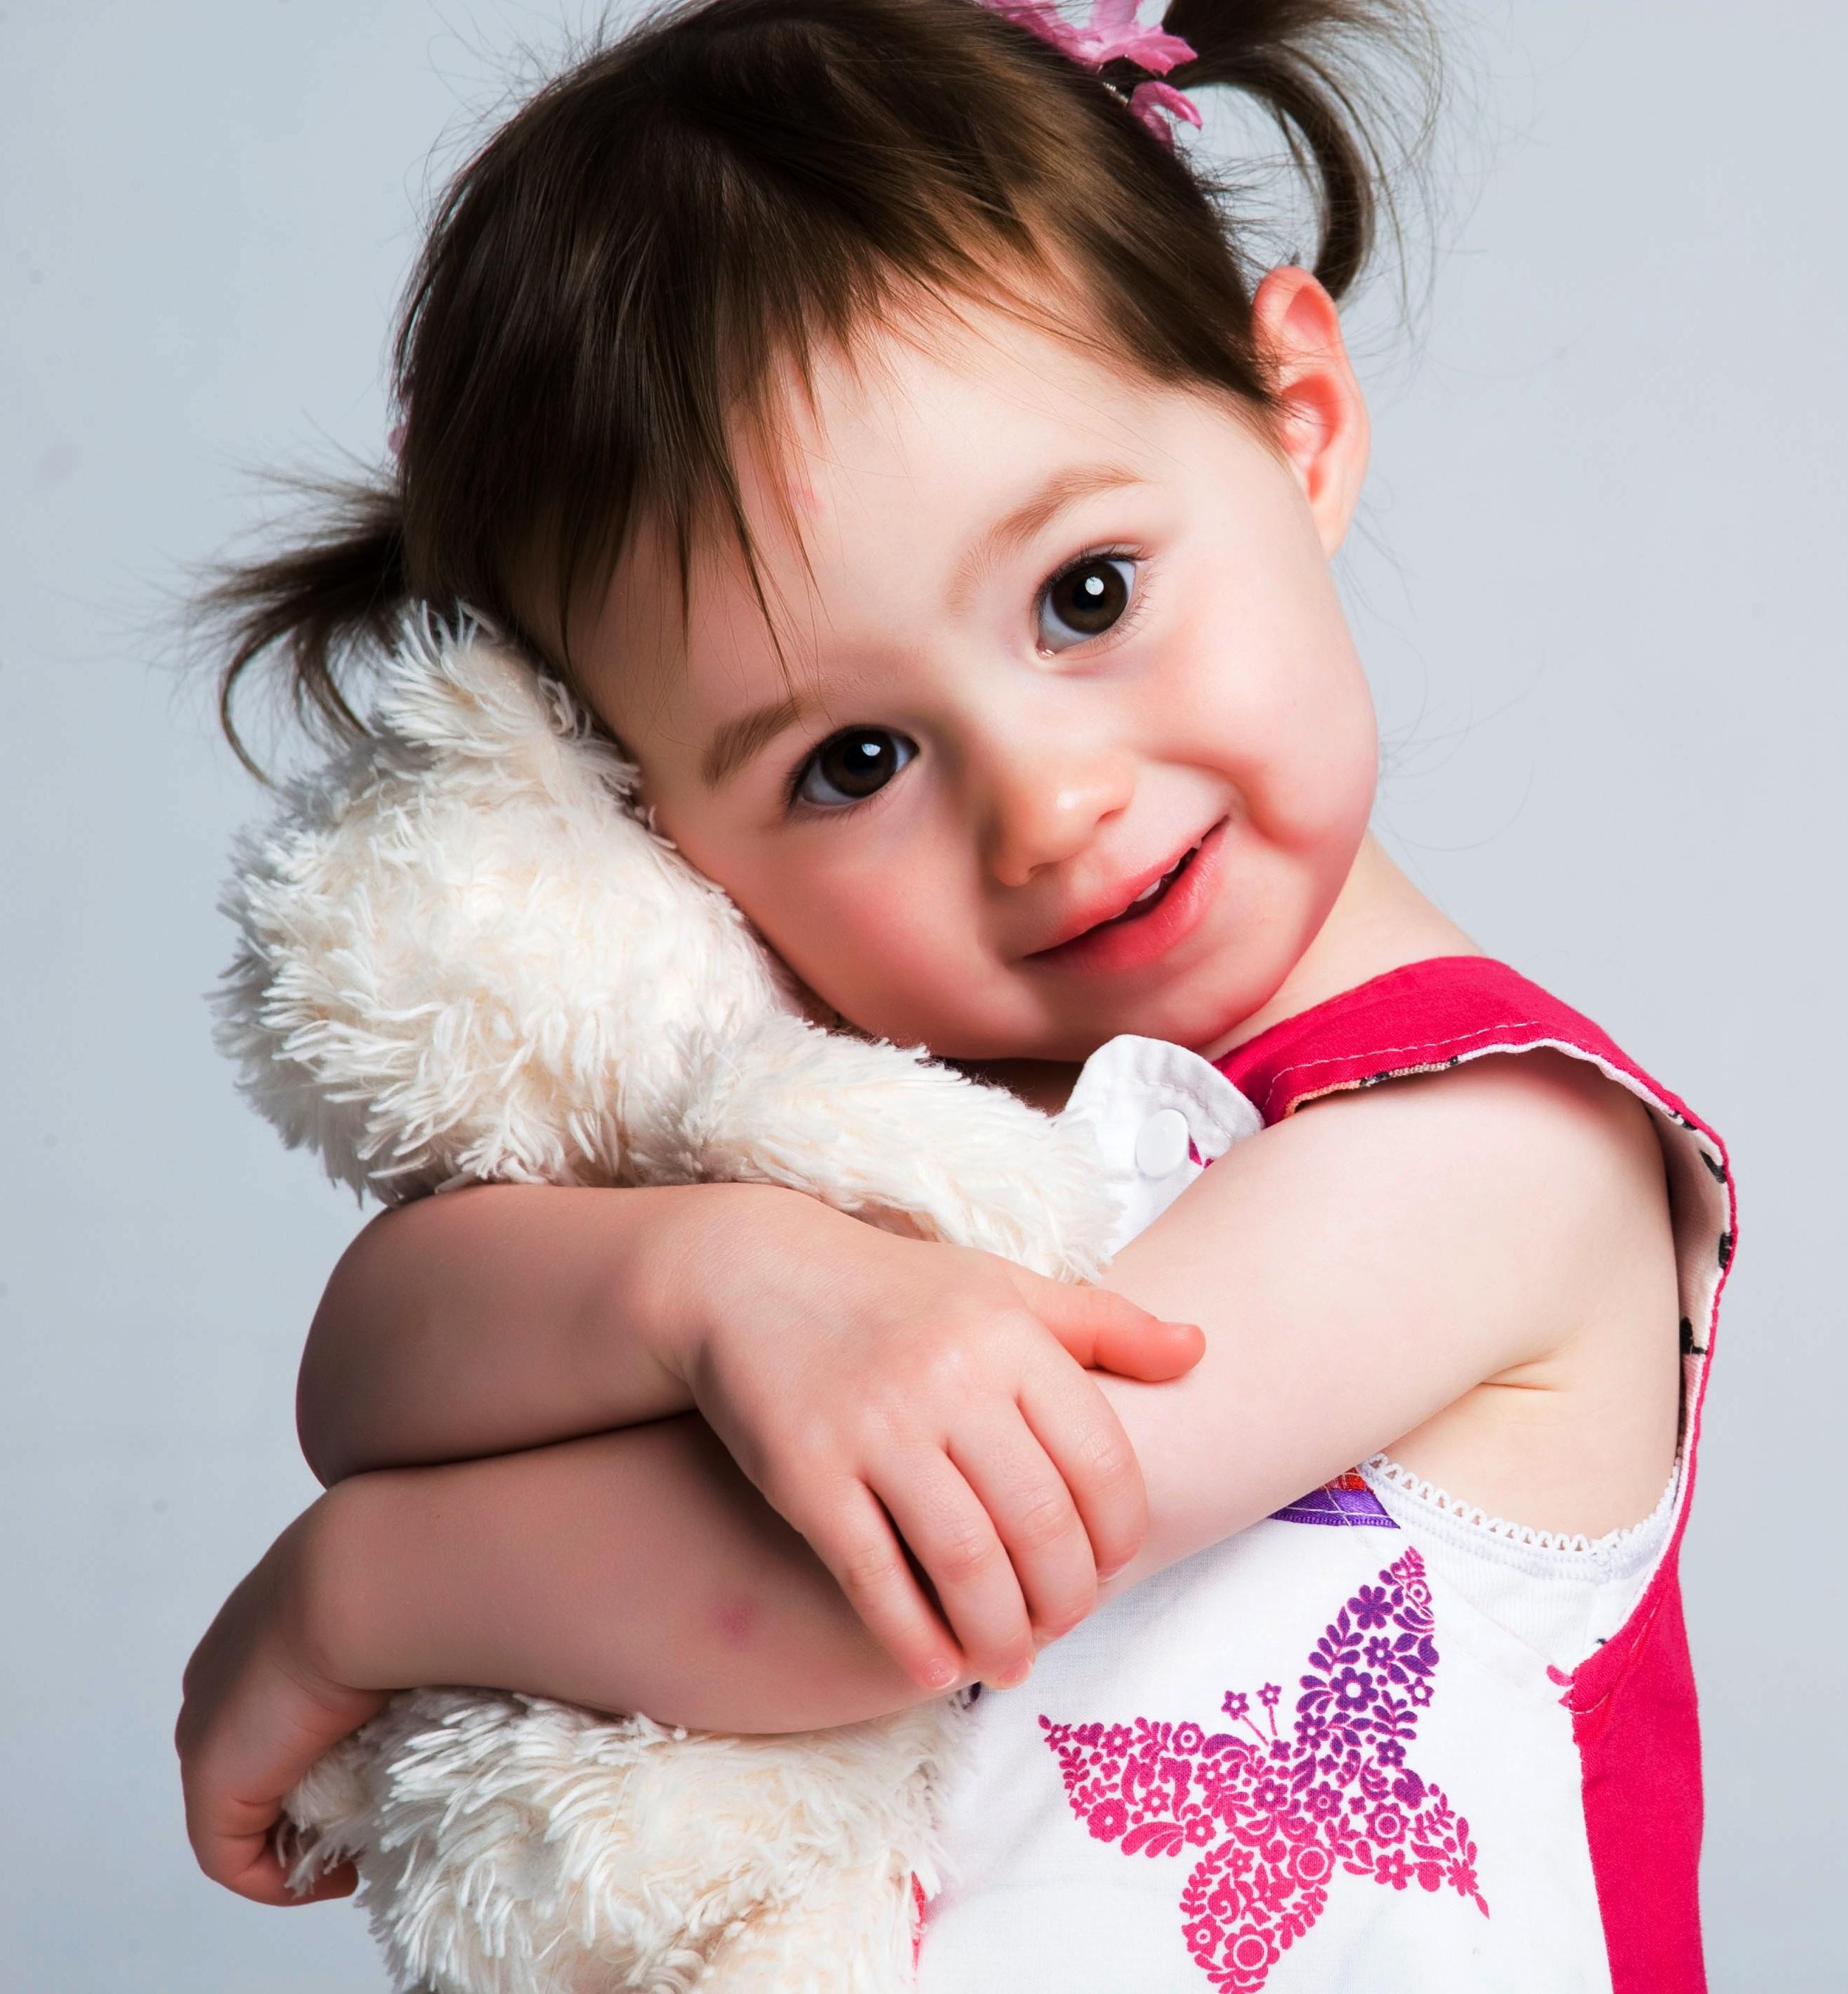 Картинки с изображением ребенка девочки